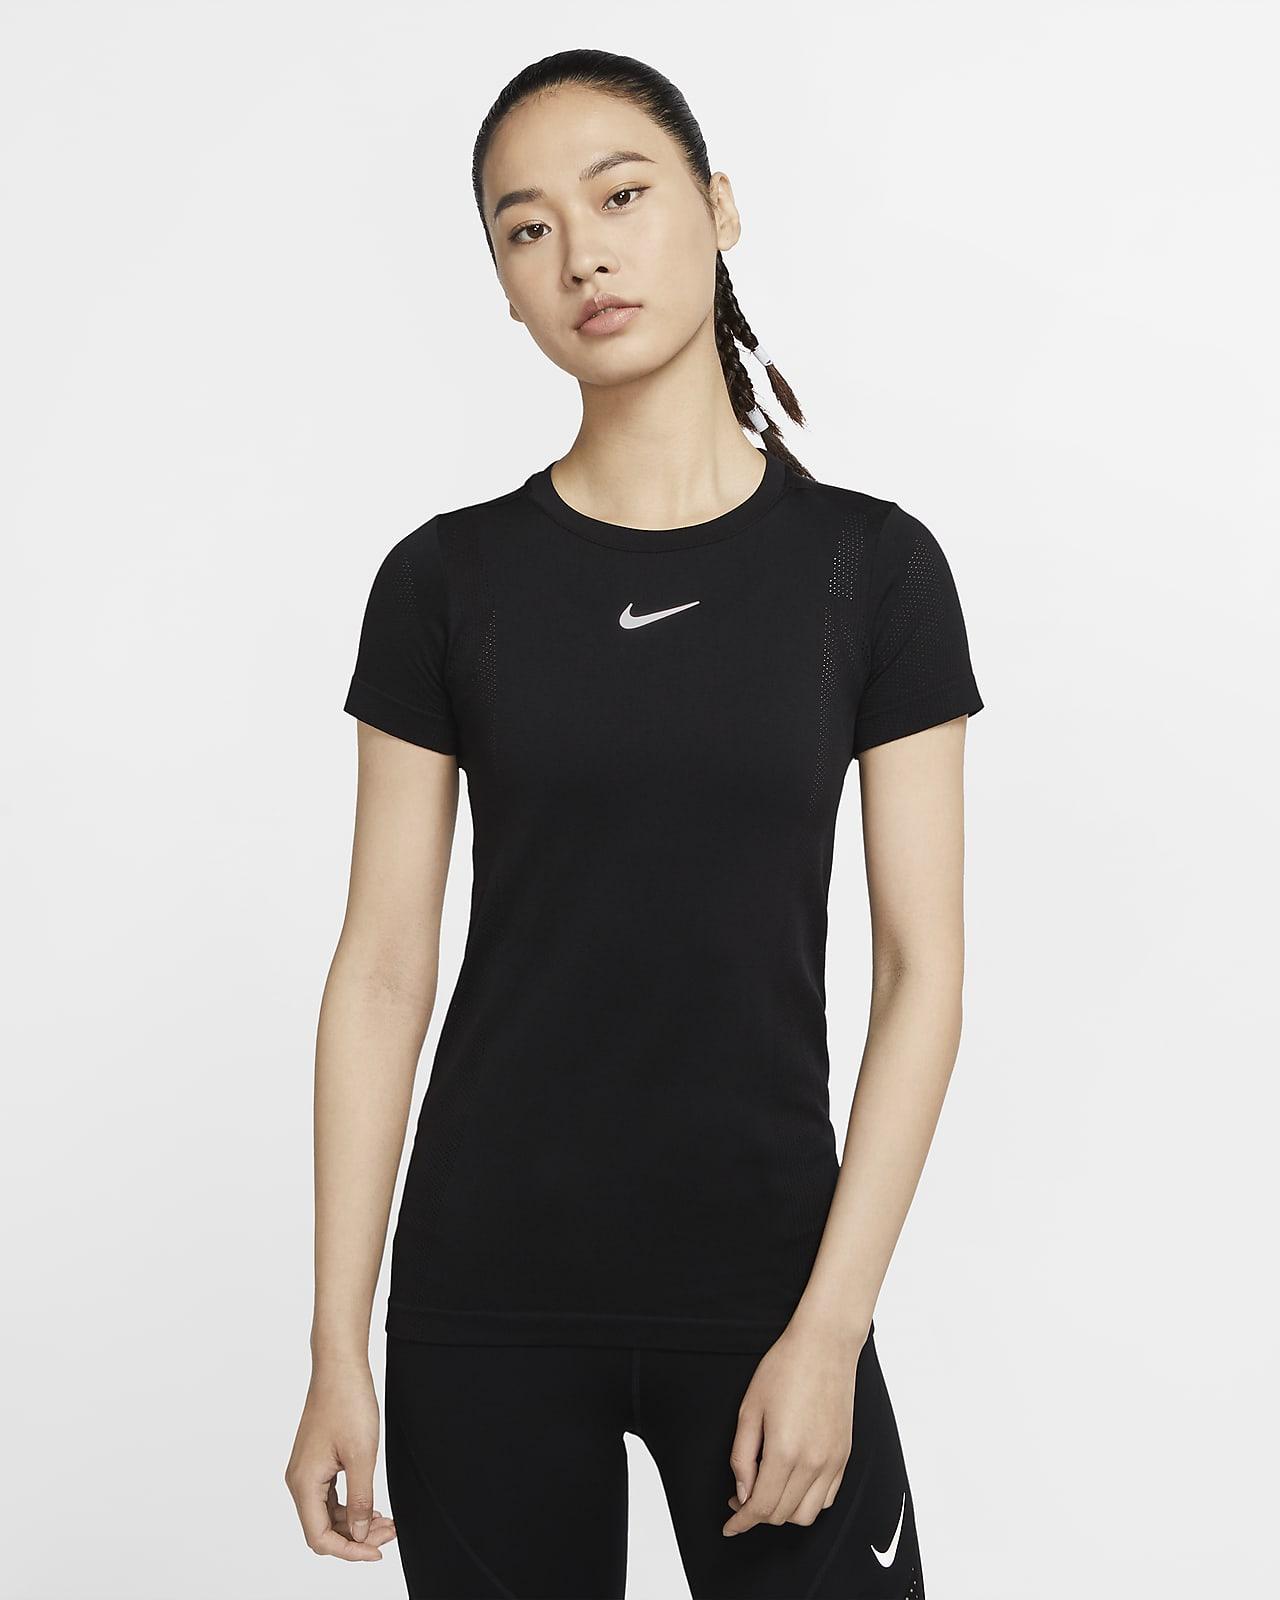 Женская беговая футболка Nike Infinite